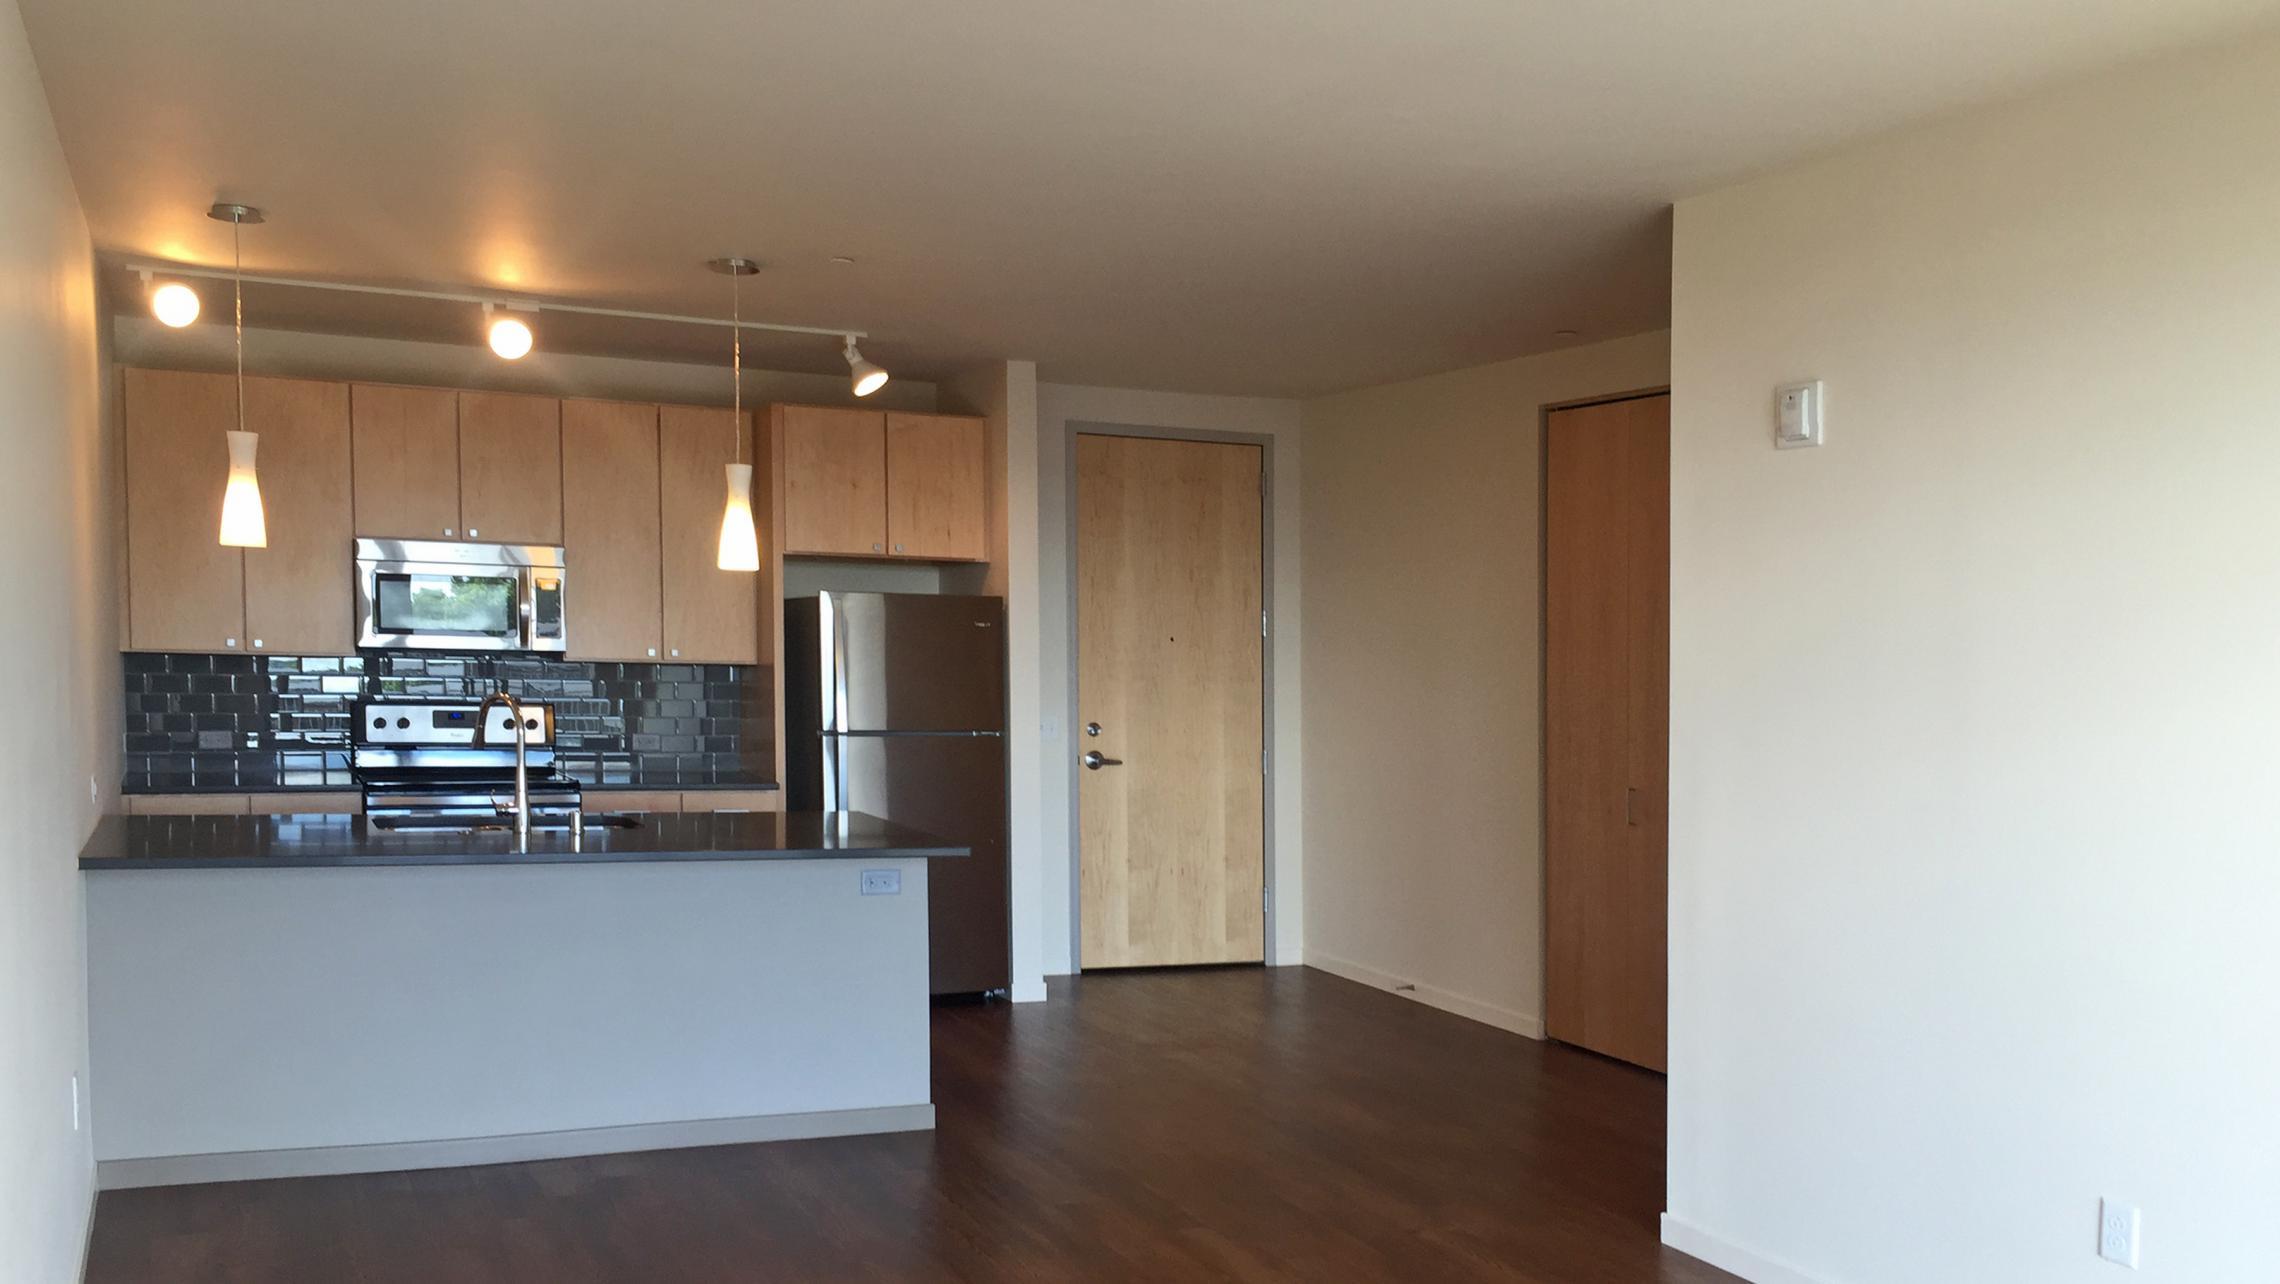 ULI Nine Line Apartment 323 - Kitchen and Living Area